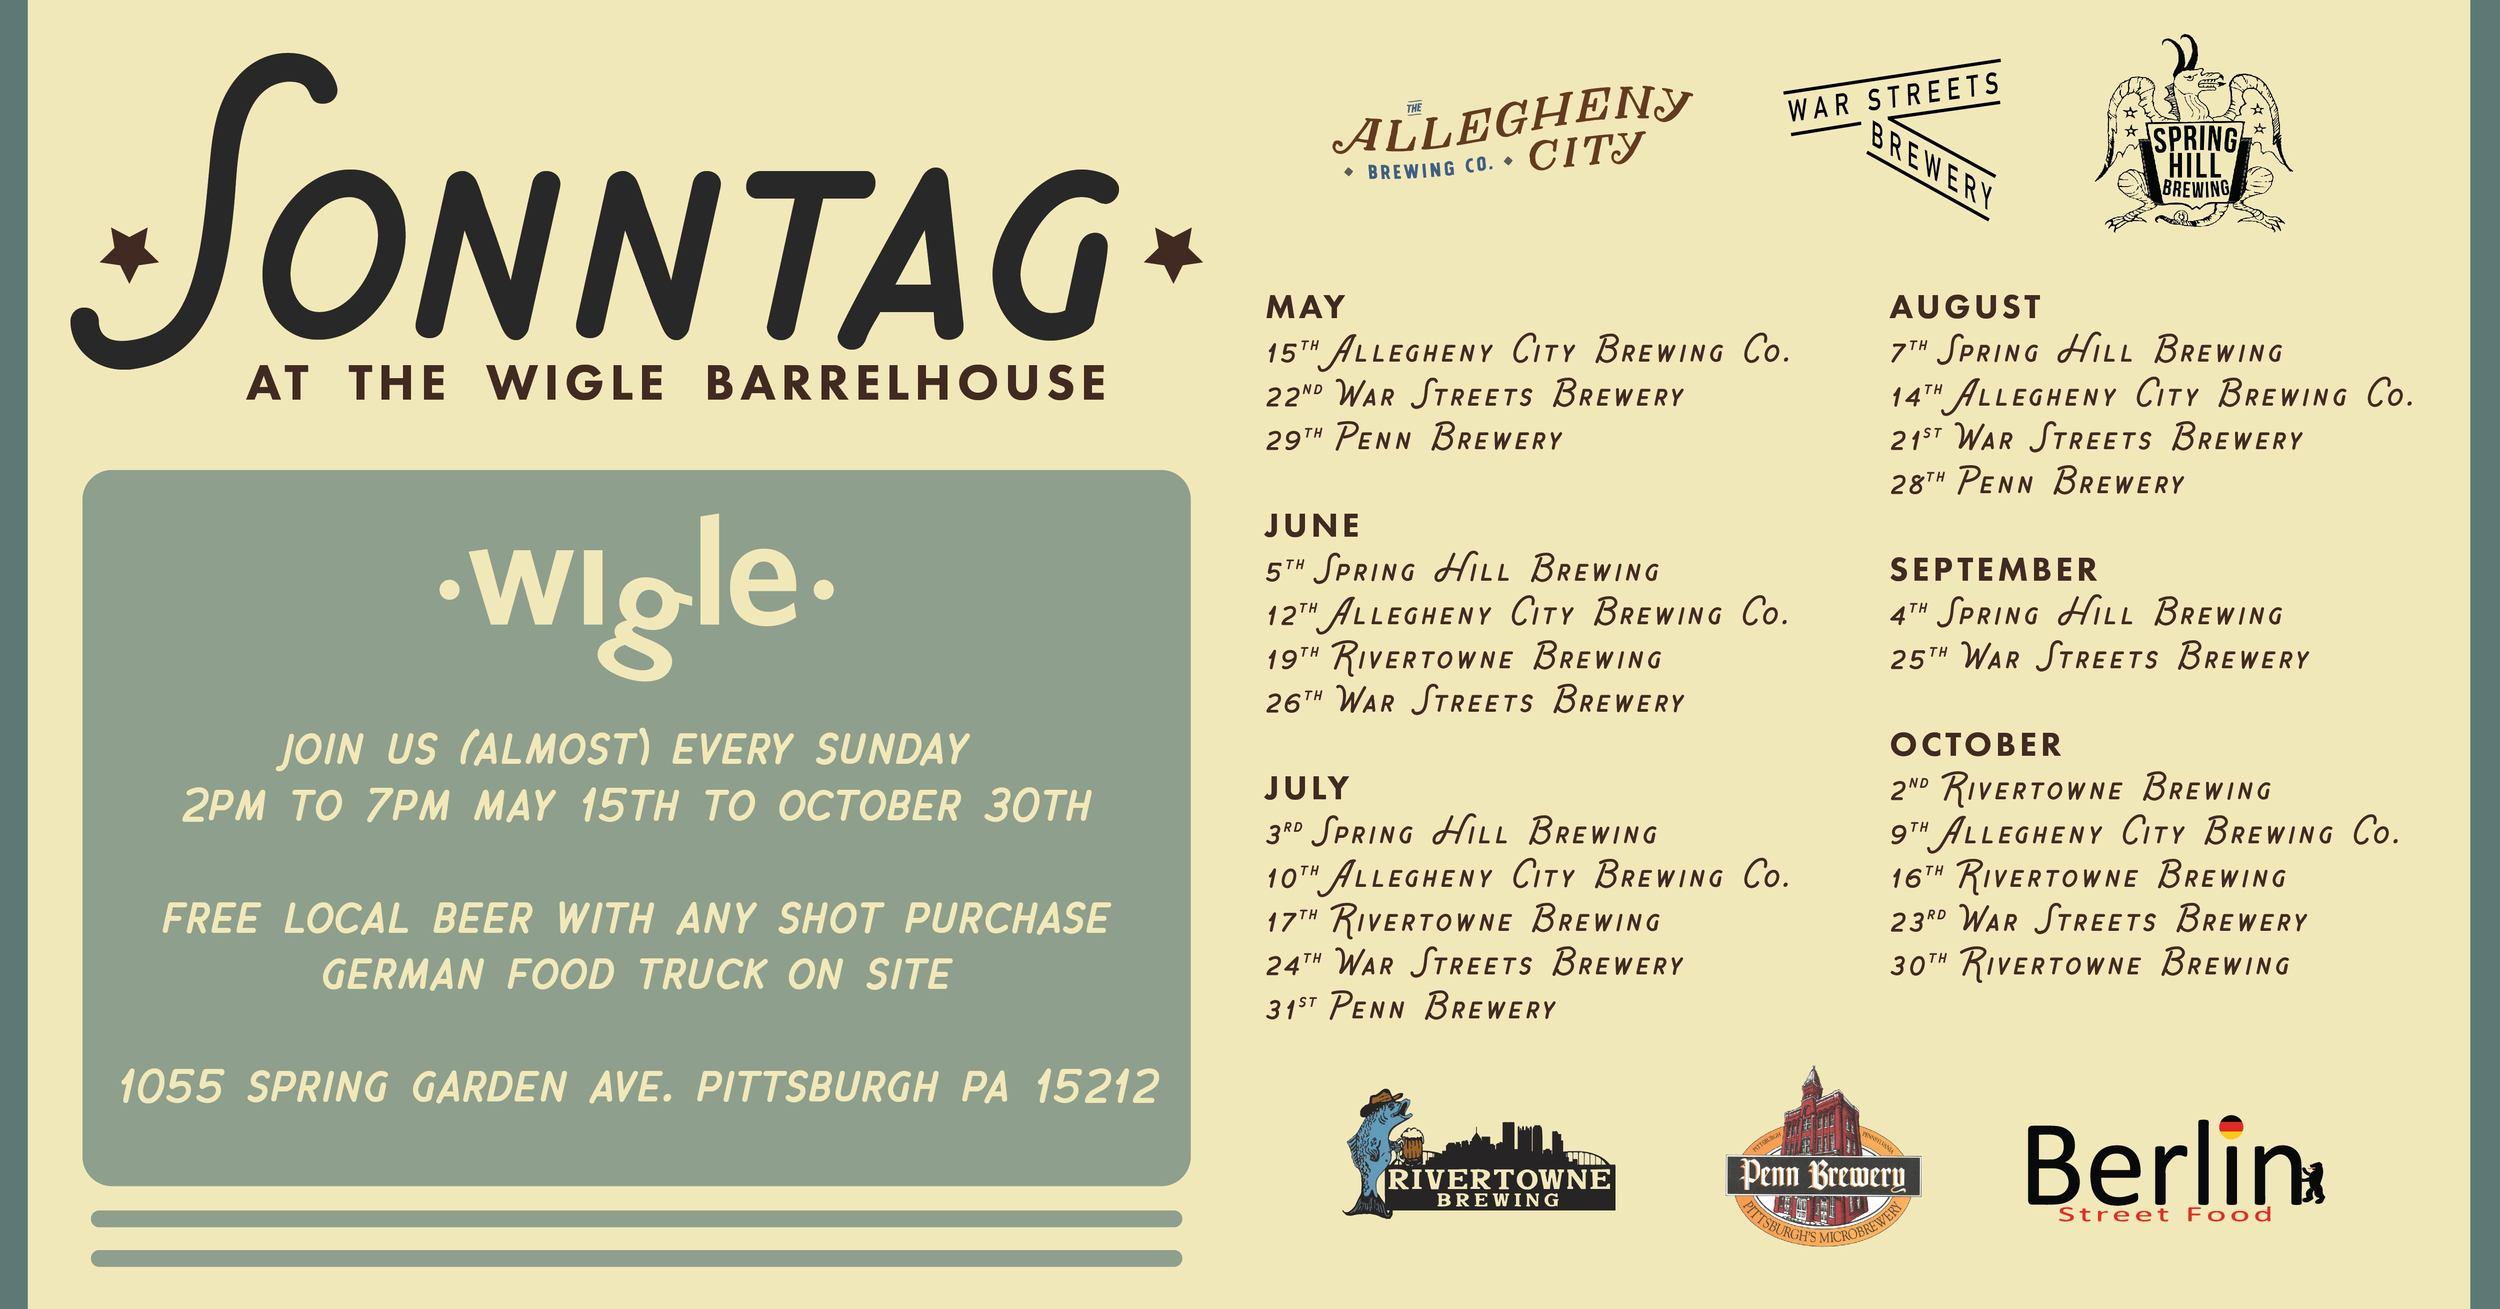 Schedule for Sonntag through October.